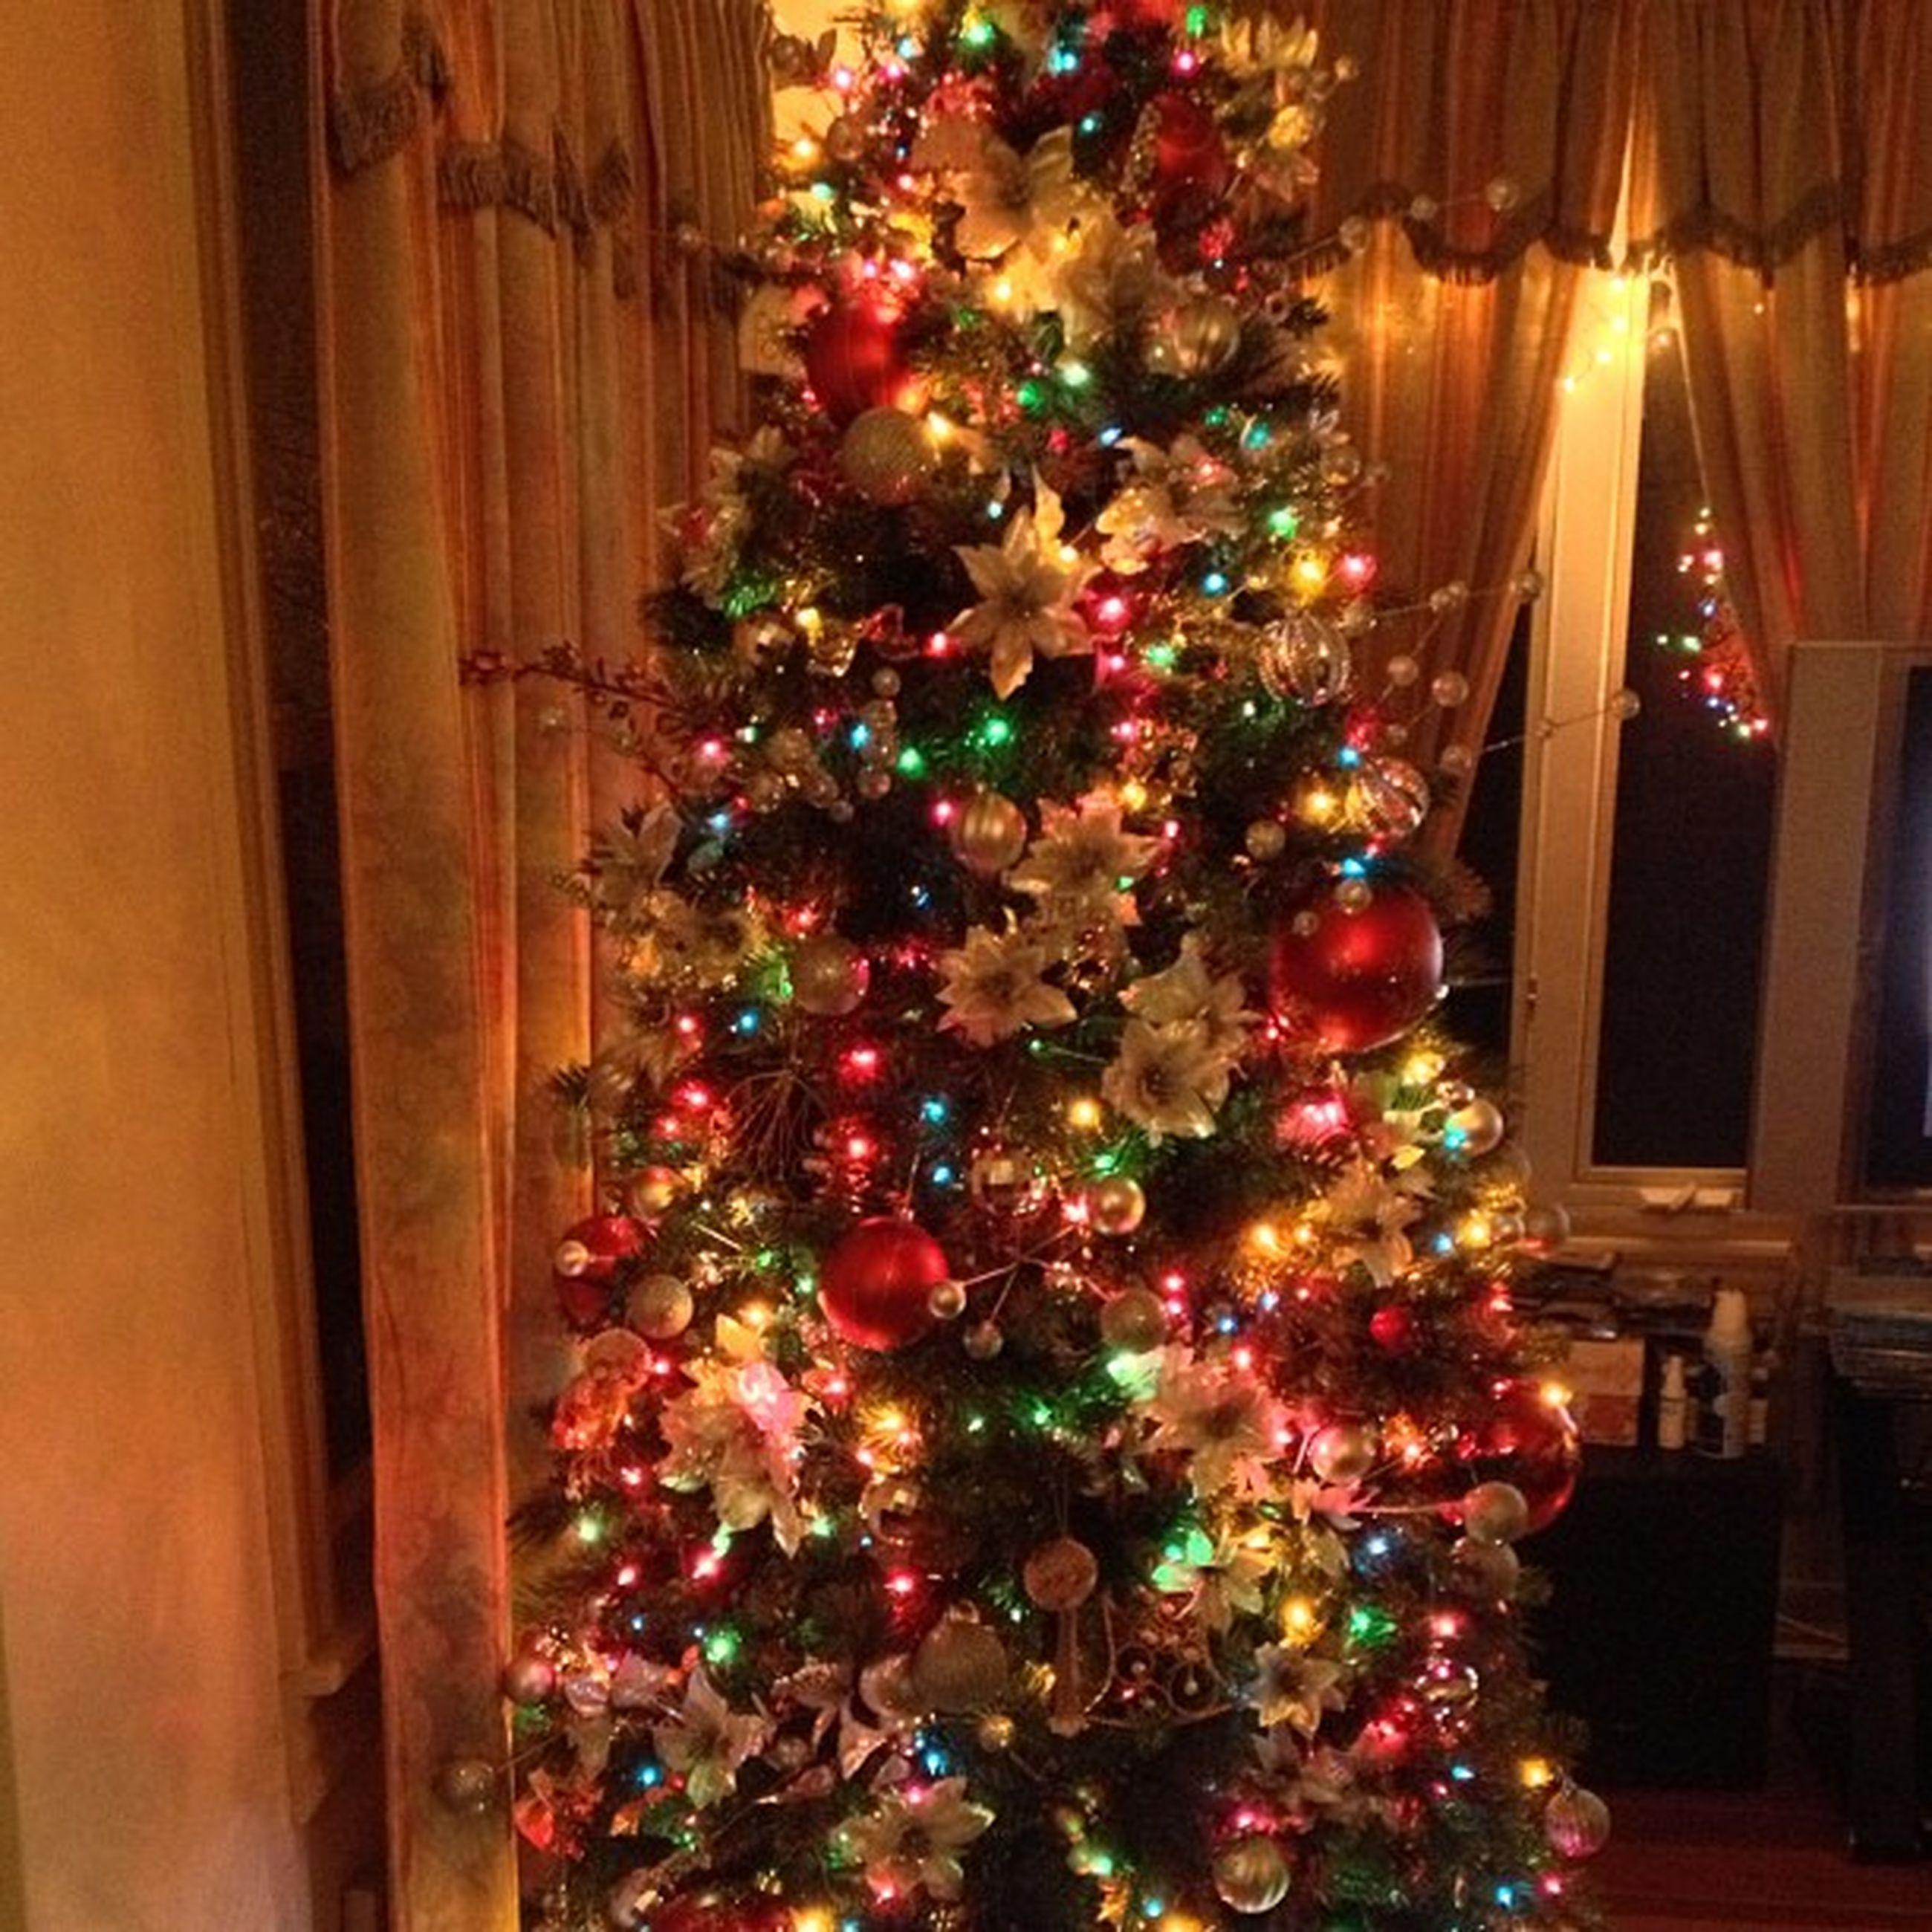 flower, decoration, celebration, indoors, christmas, tradition, illuminated, christmas decoration, christmas tree, house, freshness, built structure, bouquet, hanging, multi colored, architecture, decor, religion, abundance, cultures